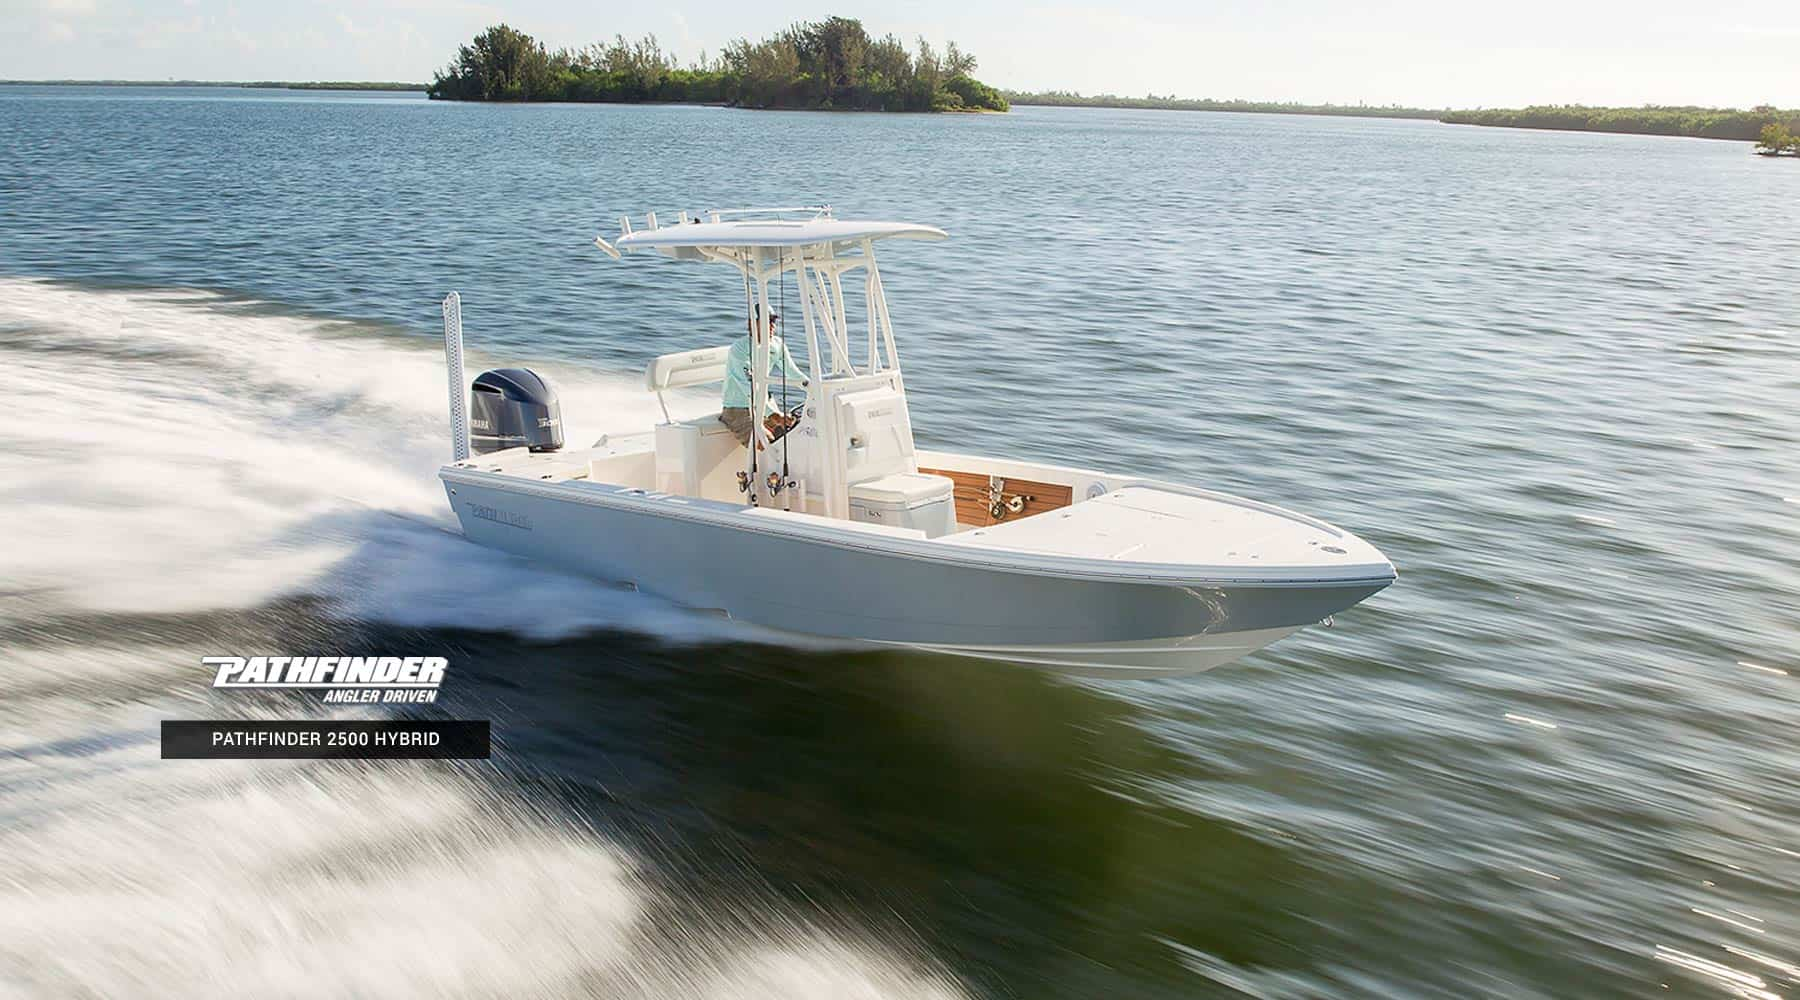 2018 Pathfinder Bay Boat 2500 Hps Hybrid Ingman Marine Fused Wiring Recipe Vendor Img